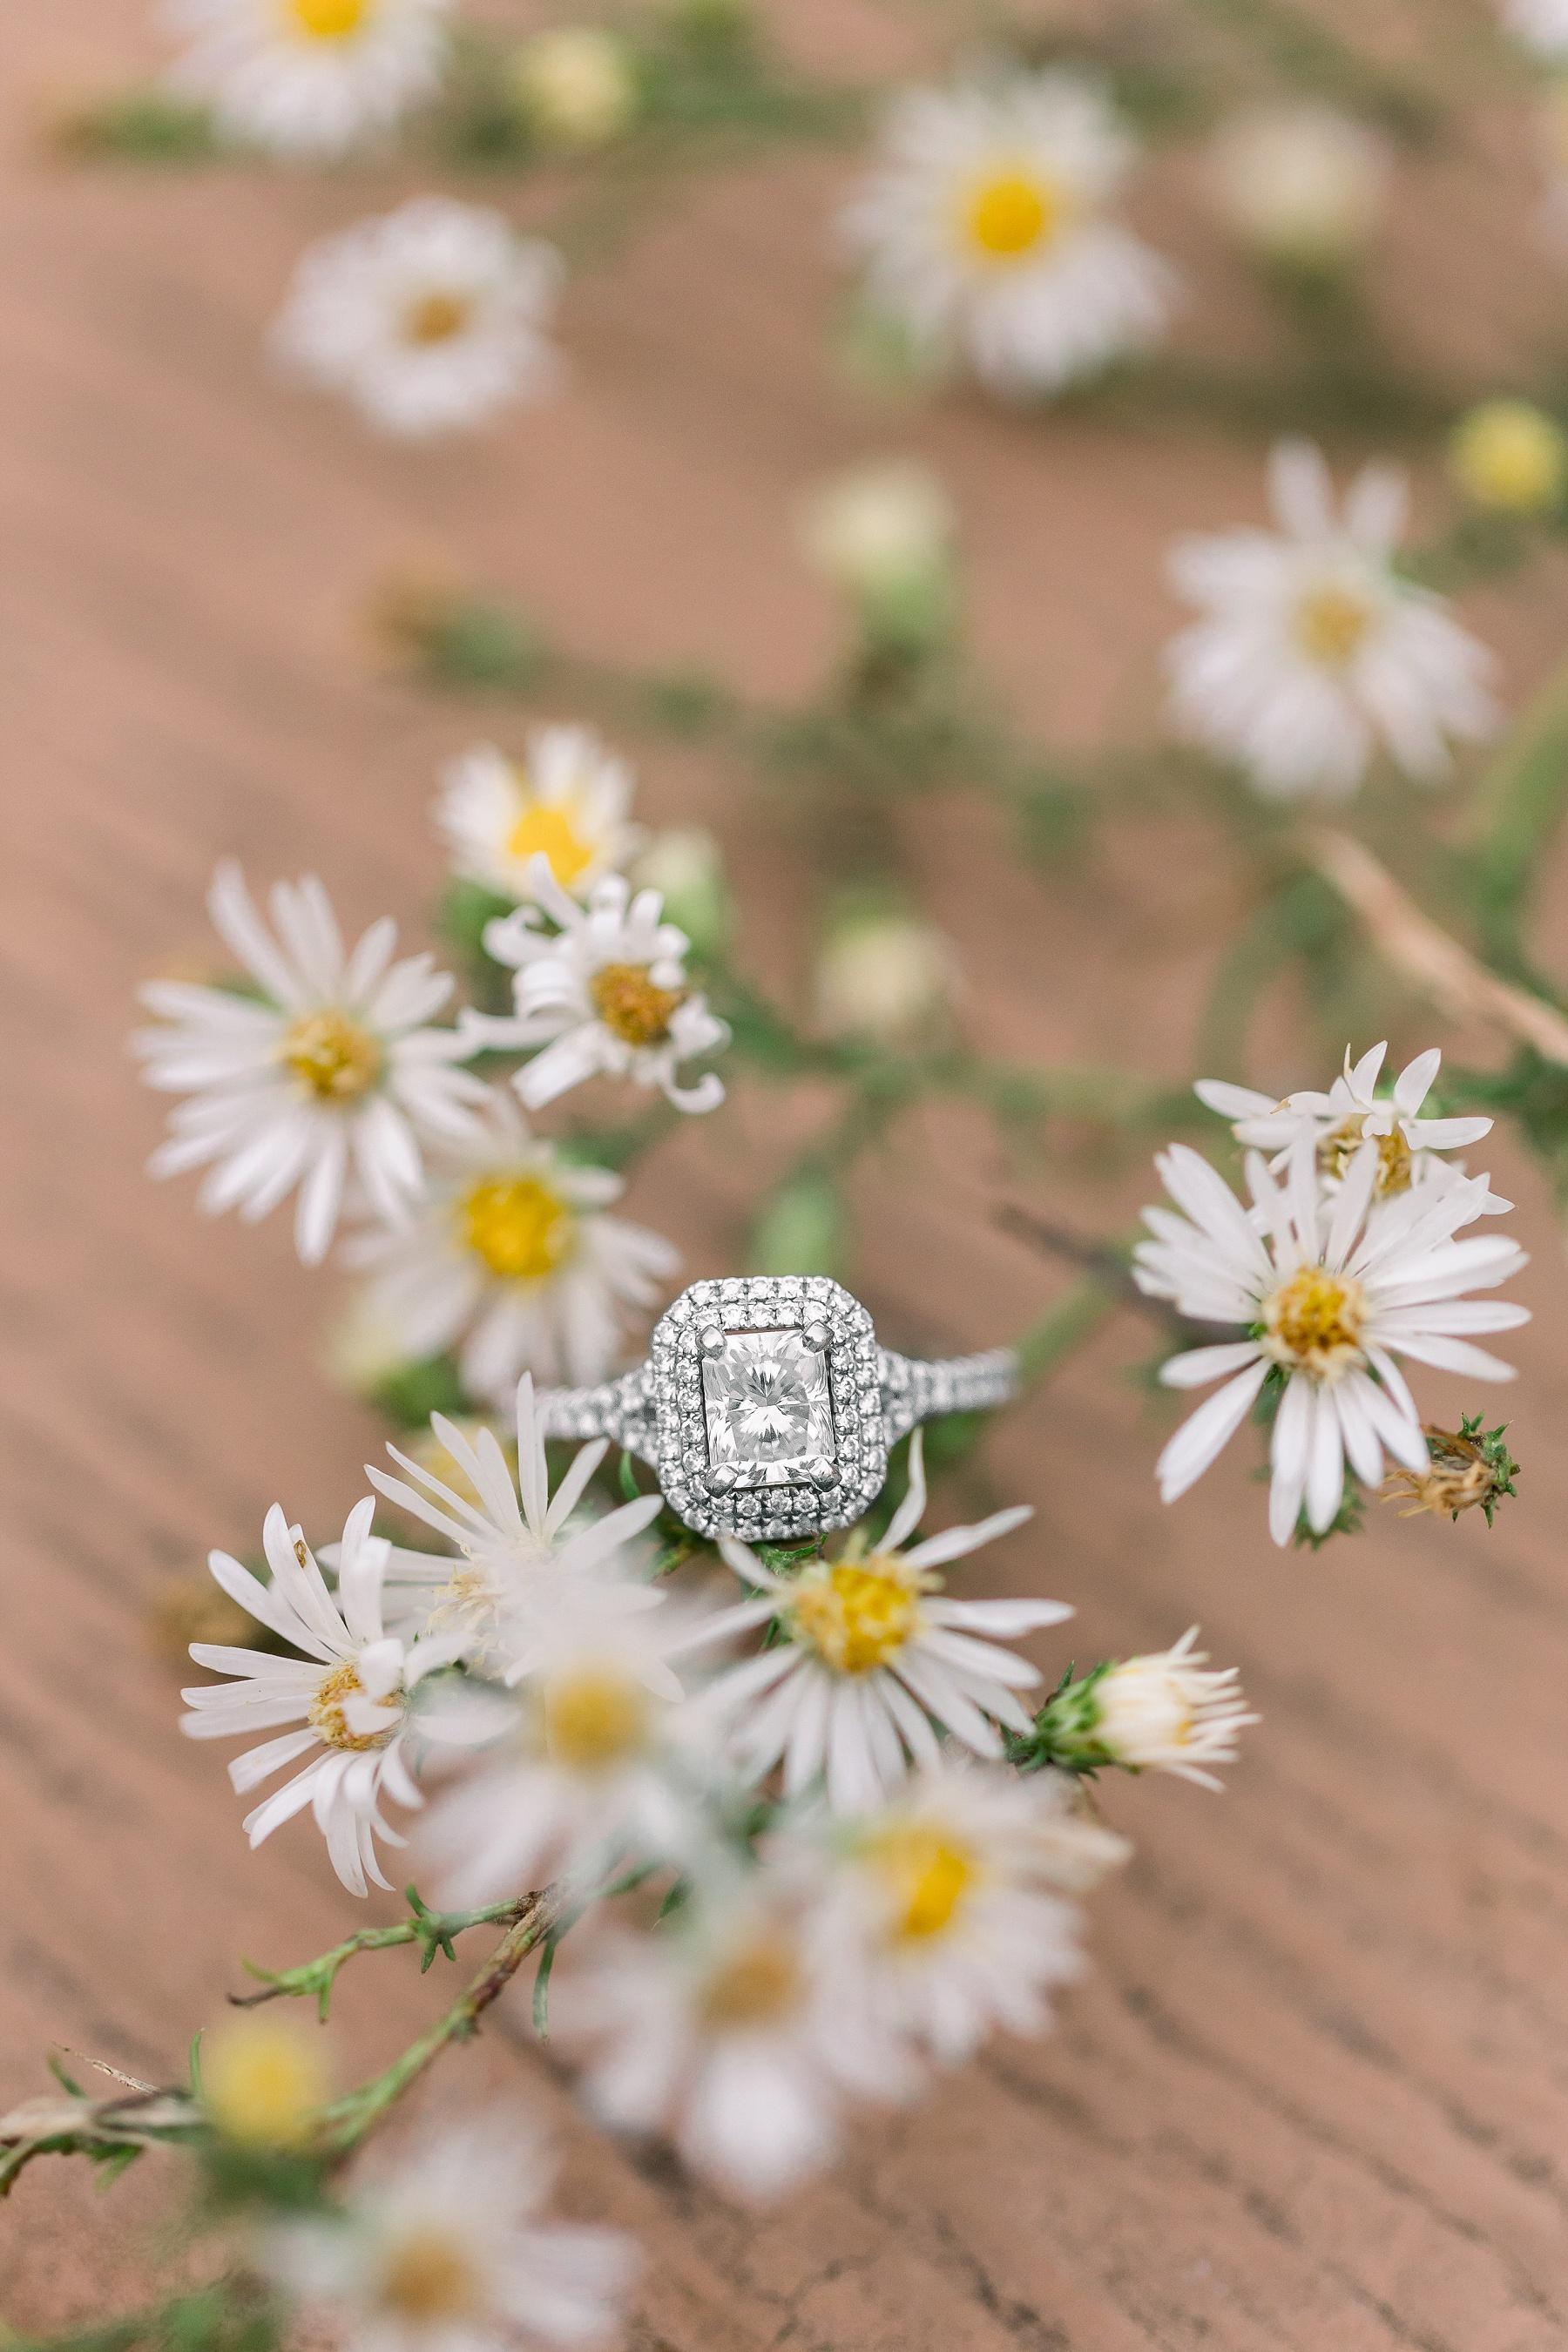 adventurous-authentic-wedding-engagement-photography-kansas-city-elizabeth-ladean-photo_5396.jpg